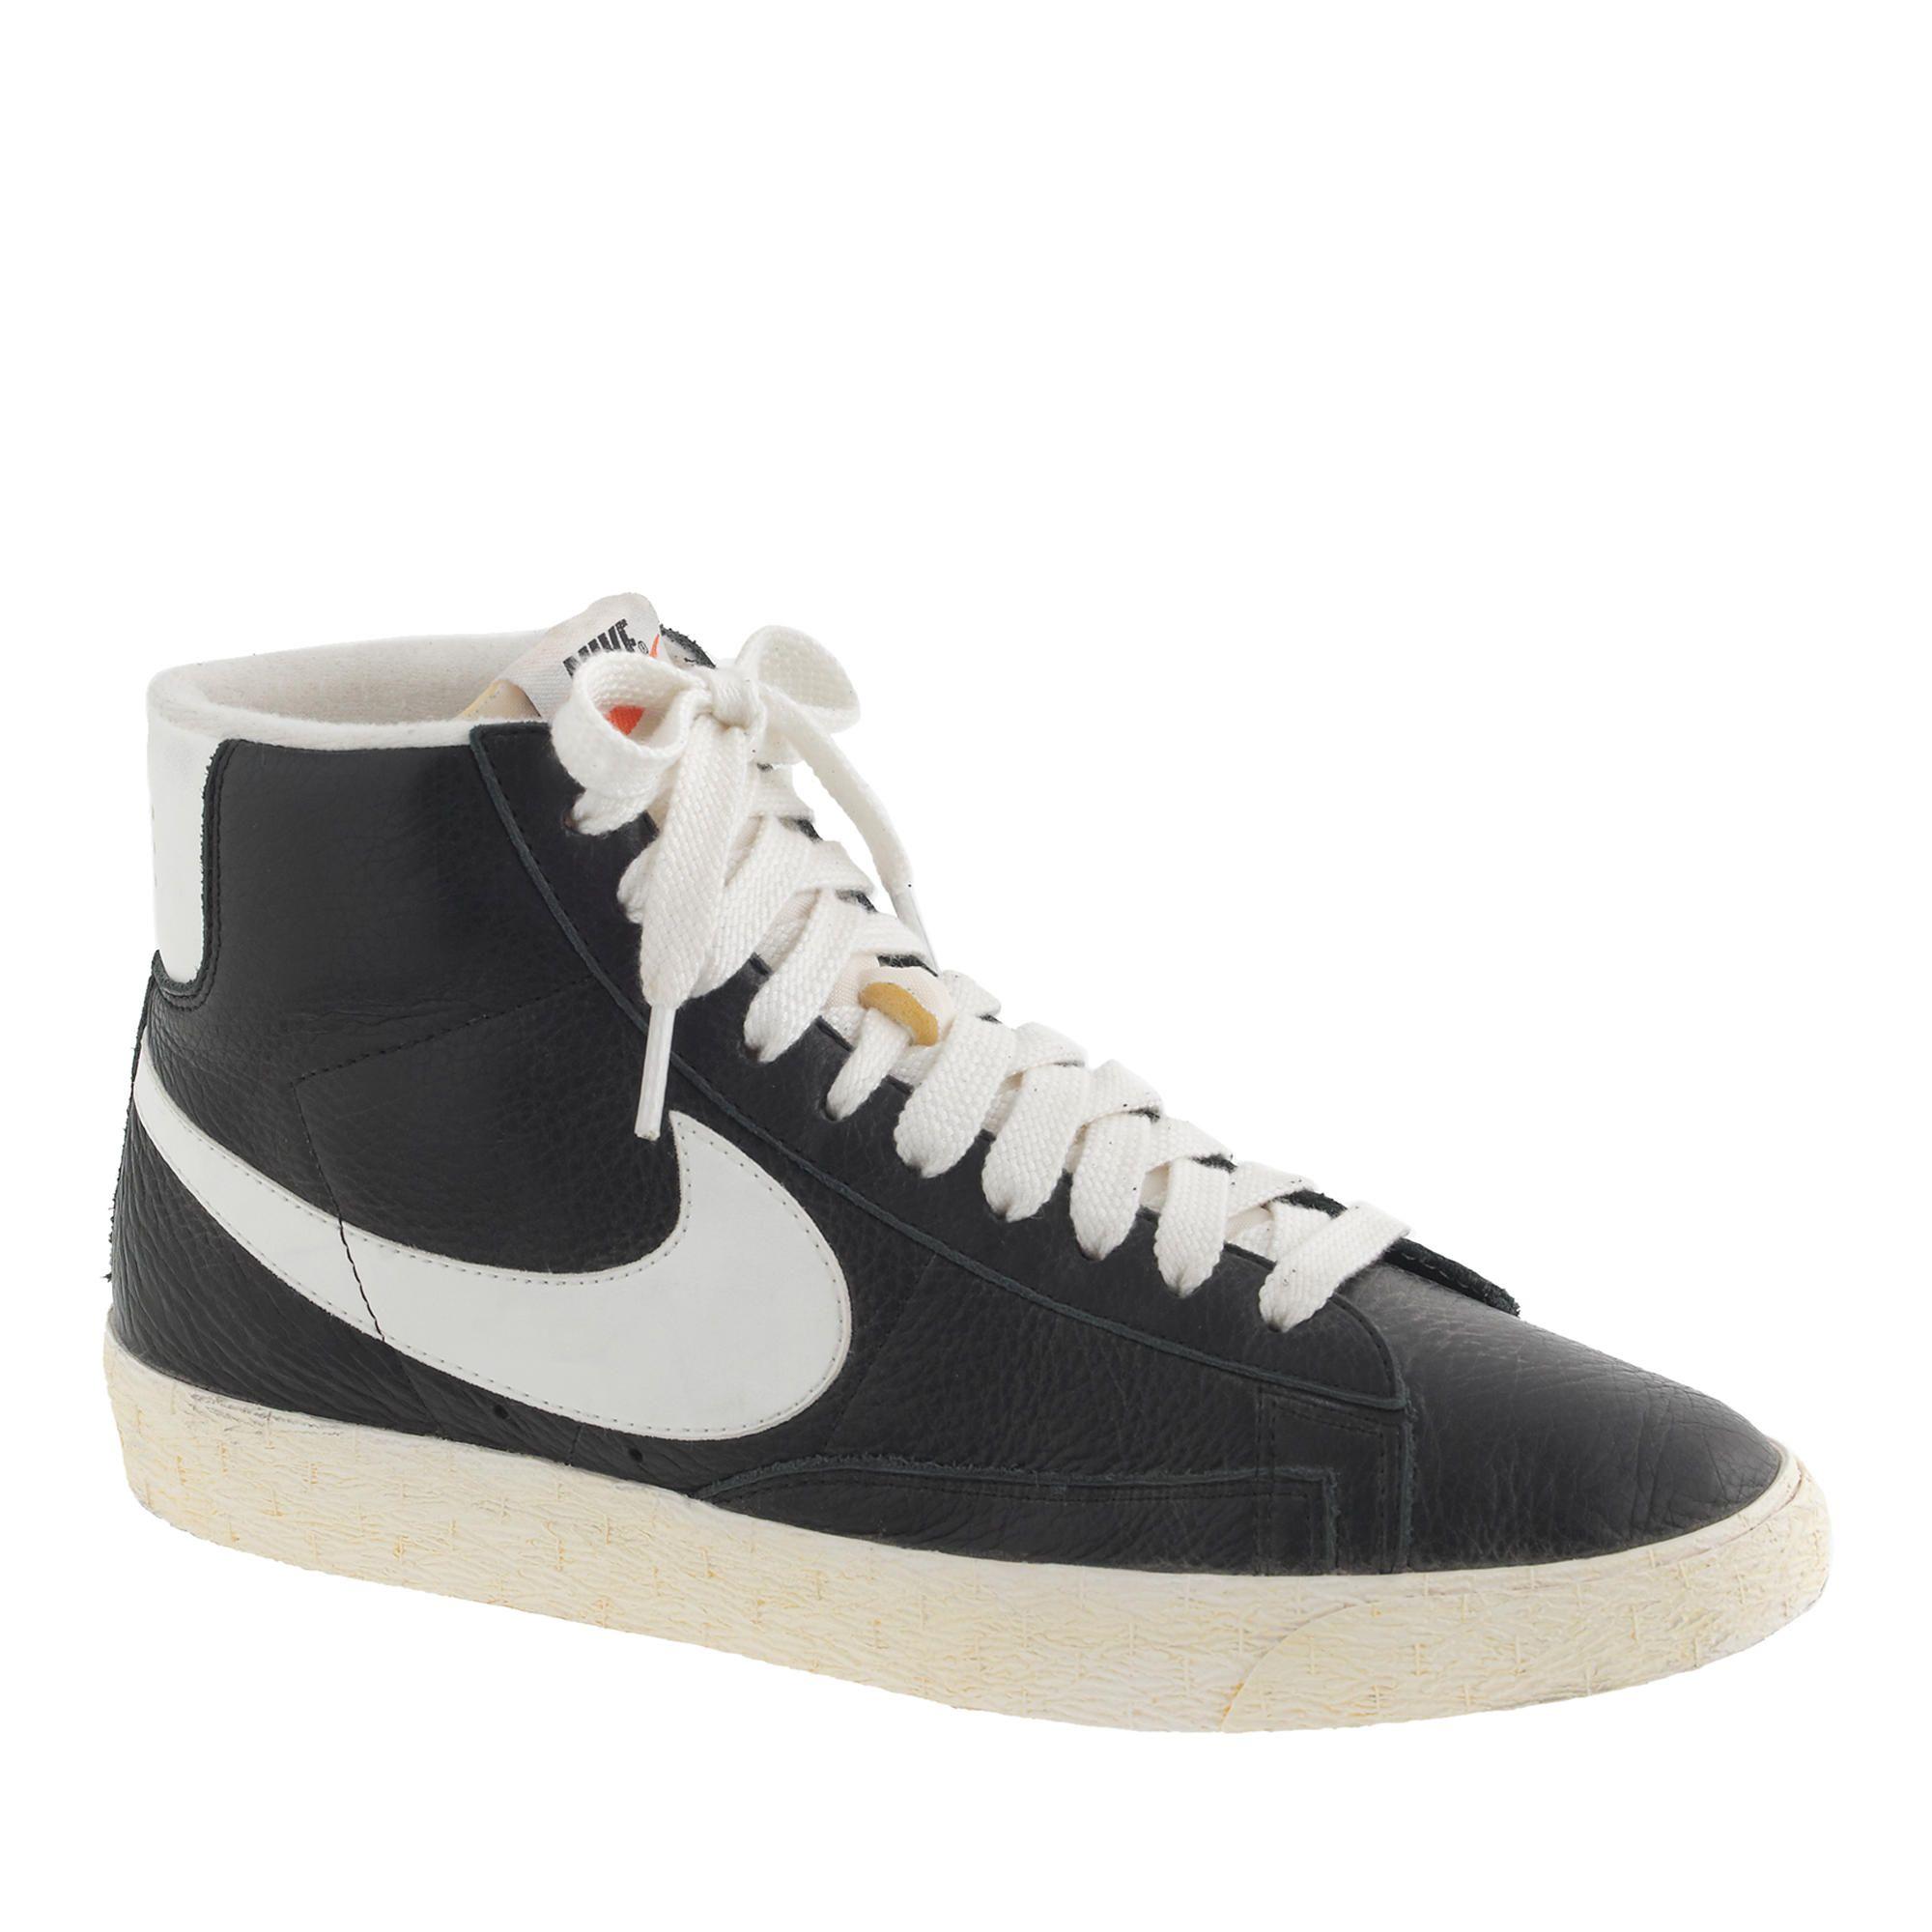 f9fc64f2c3 Women's Nike® Blazer mid vintage sneakers in black : sneakers | J.Crew